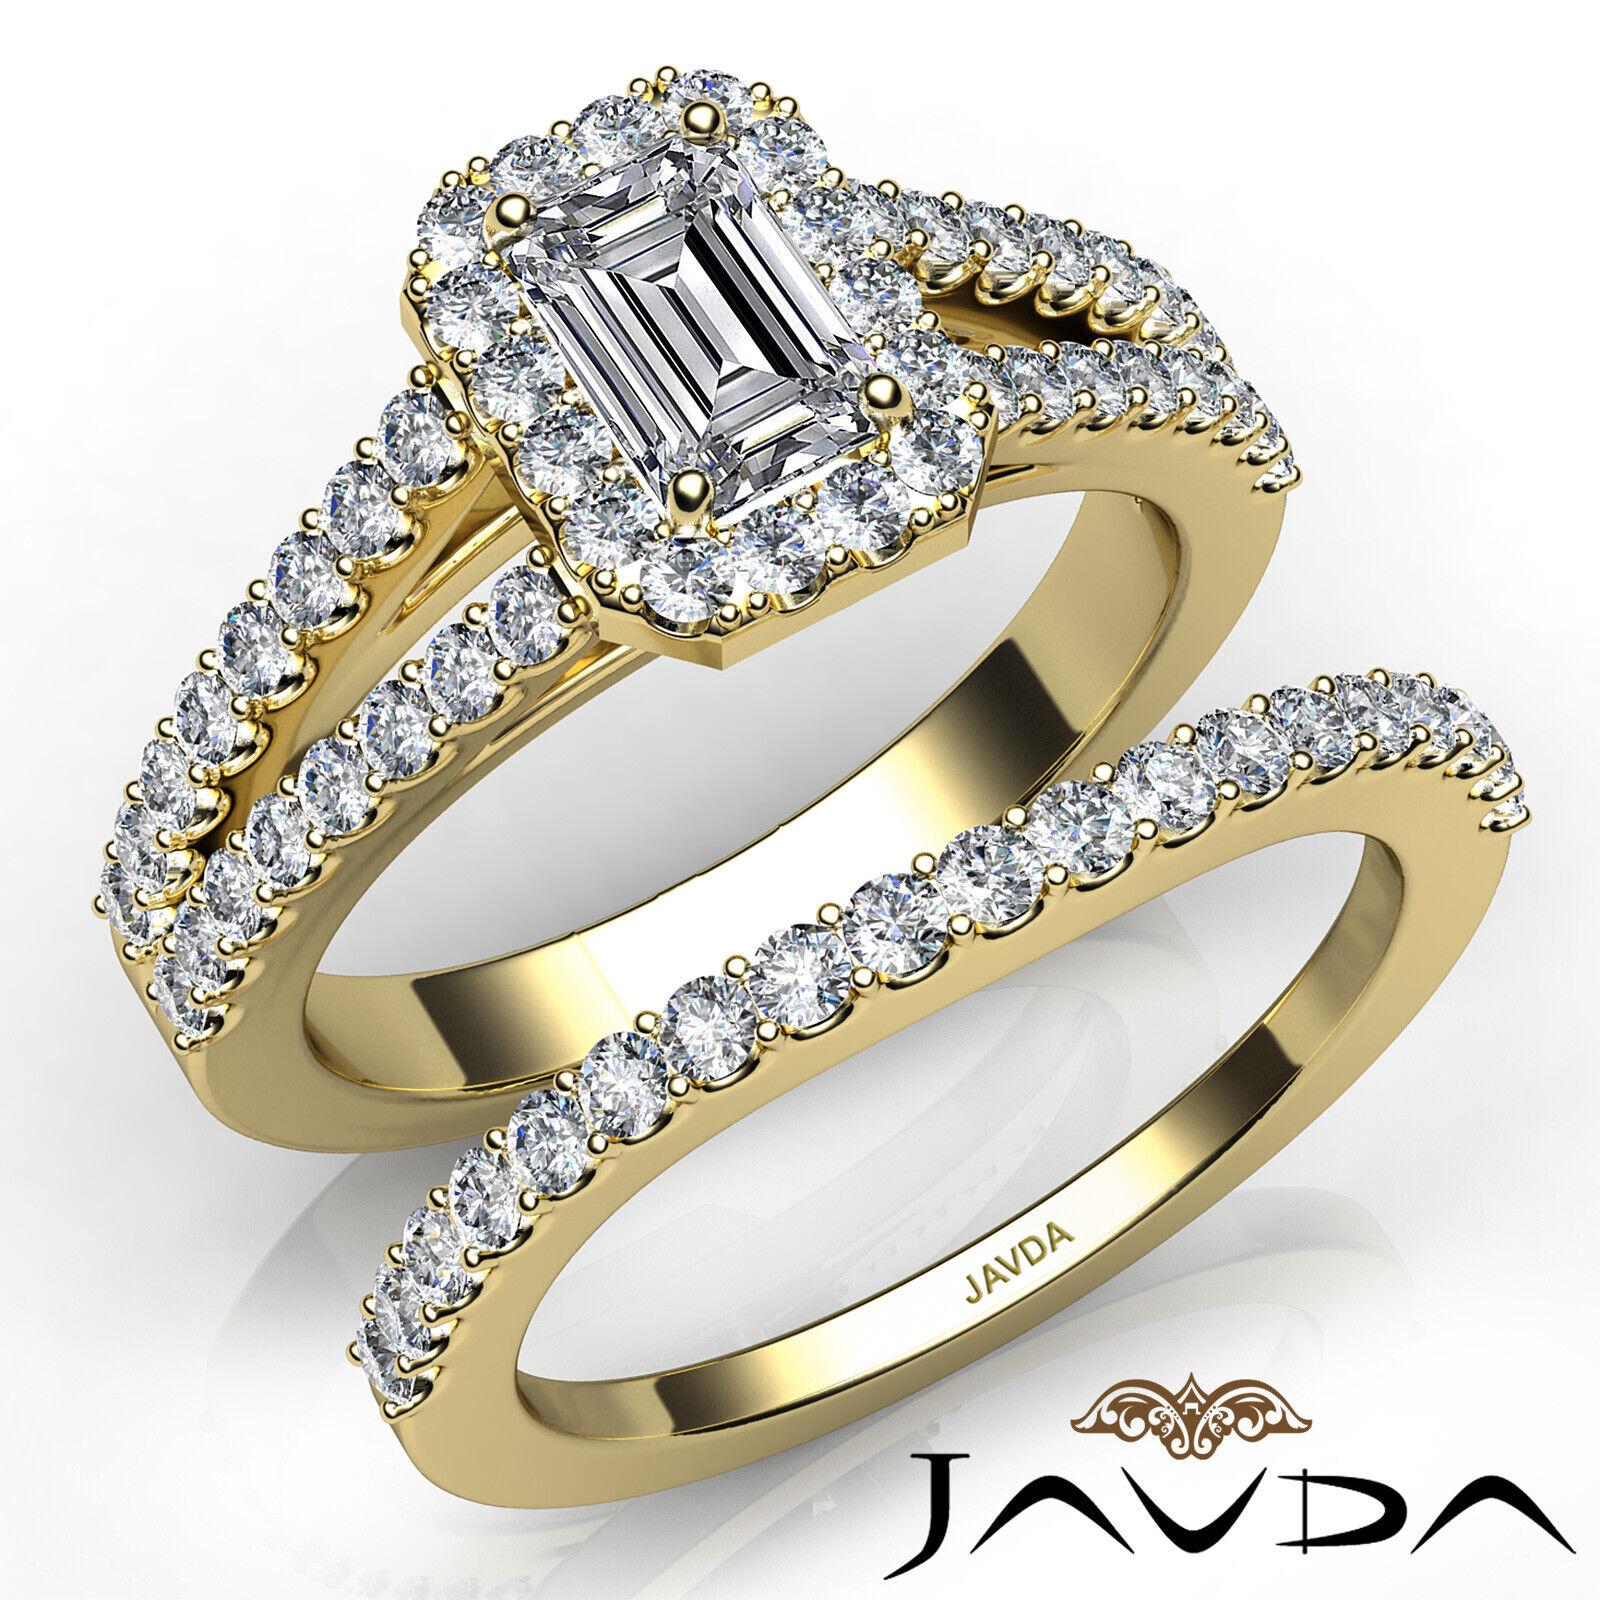 1.75ctw Halo Sidestone Bridal Emerald Diamond Engagement Ring GIA H-VS2 W Gold 8